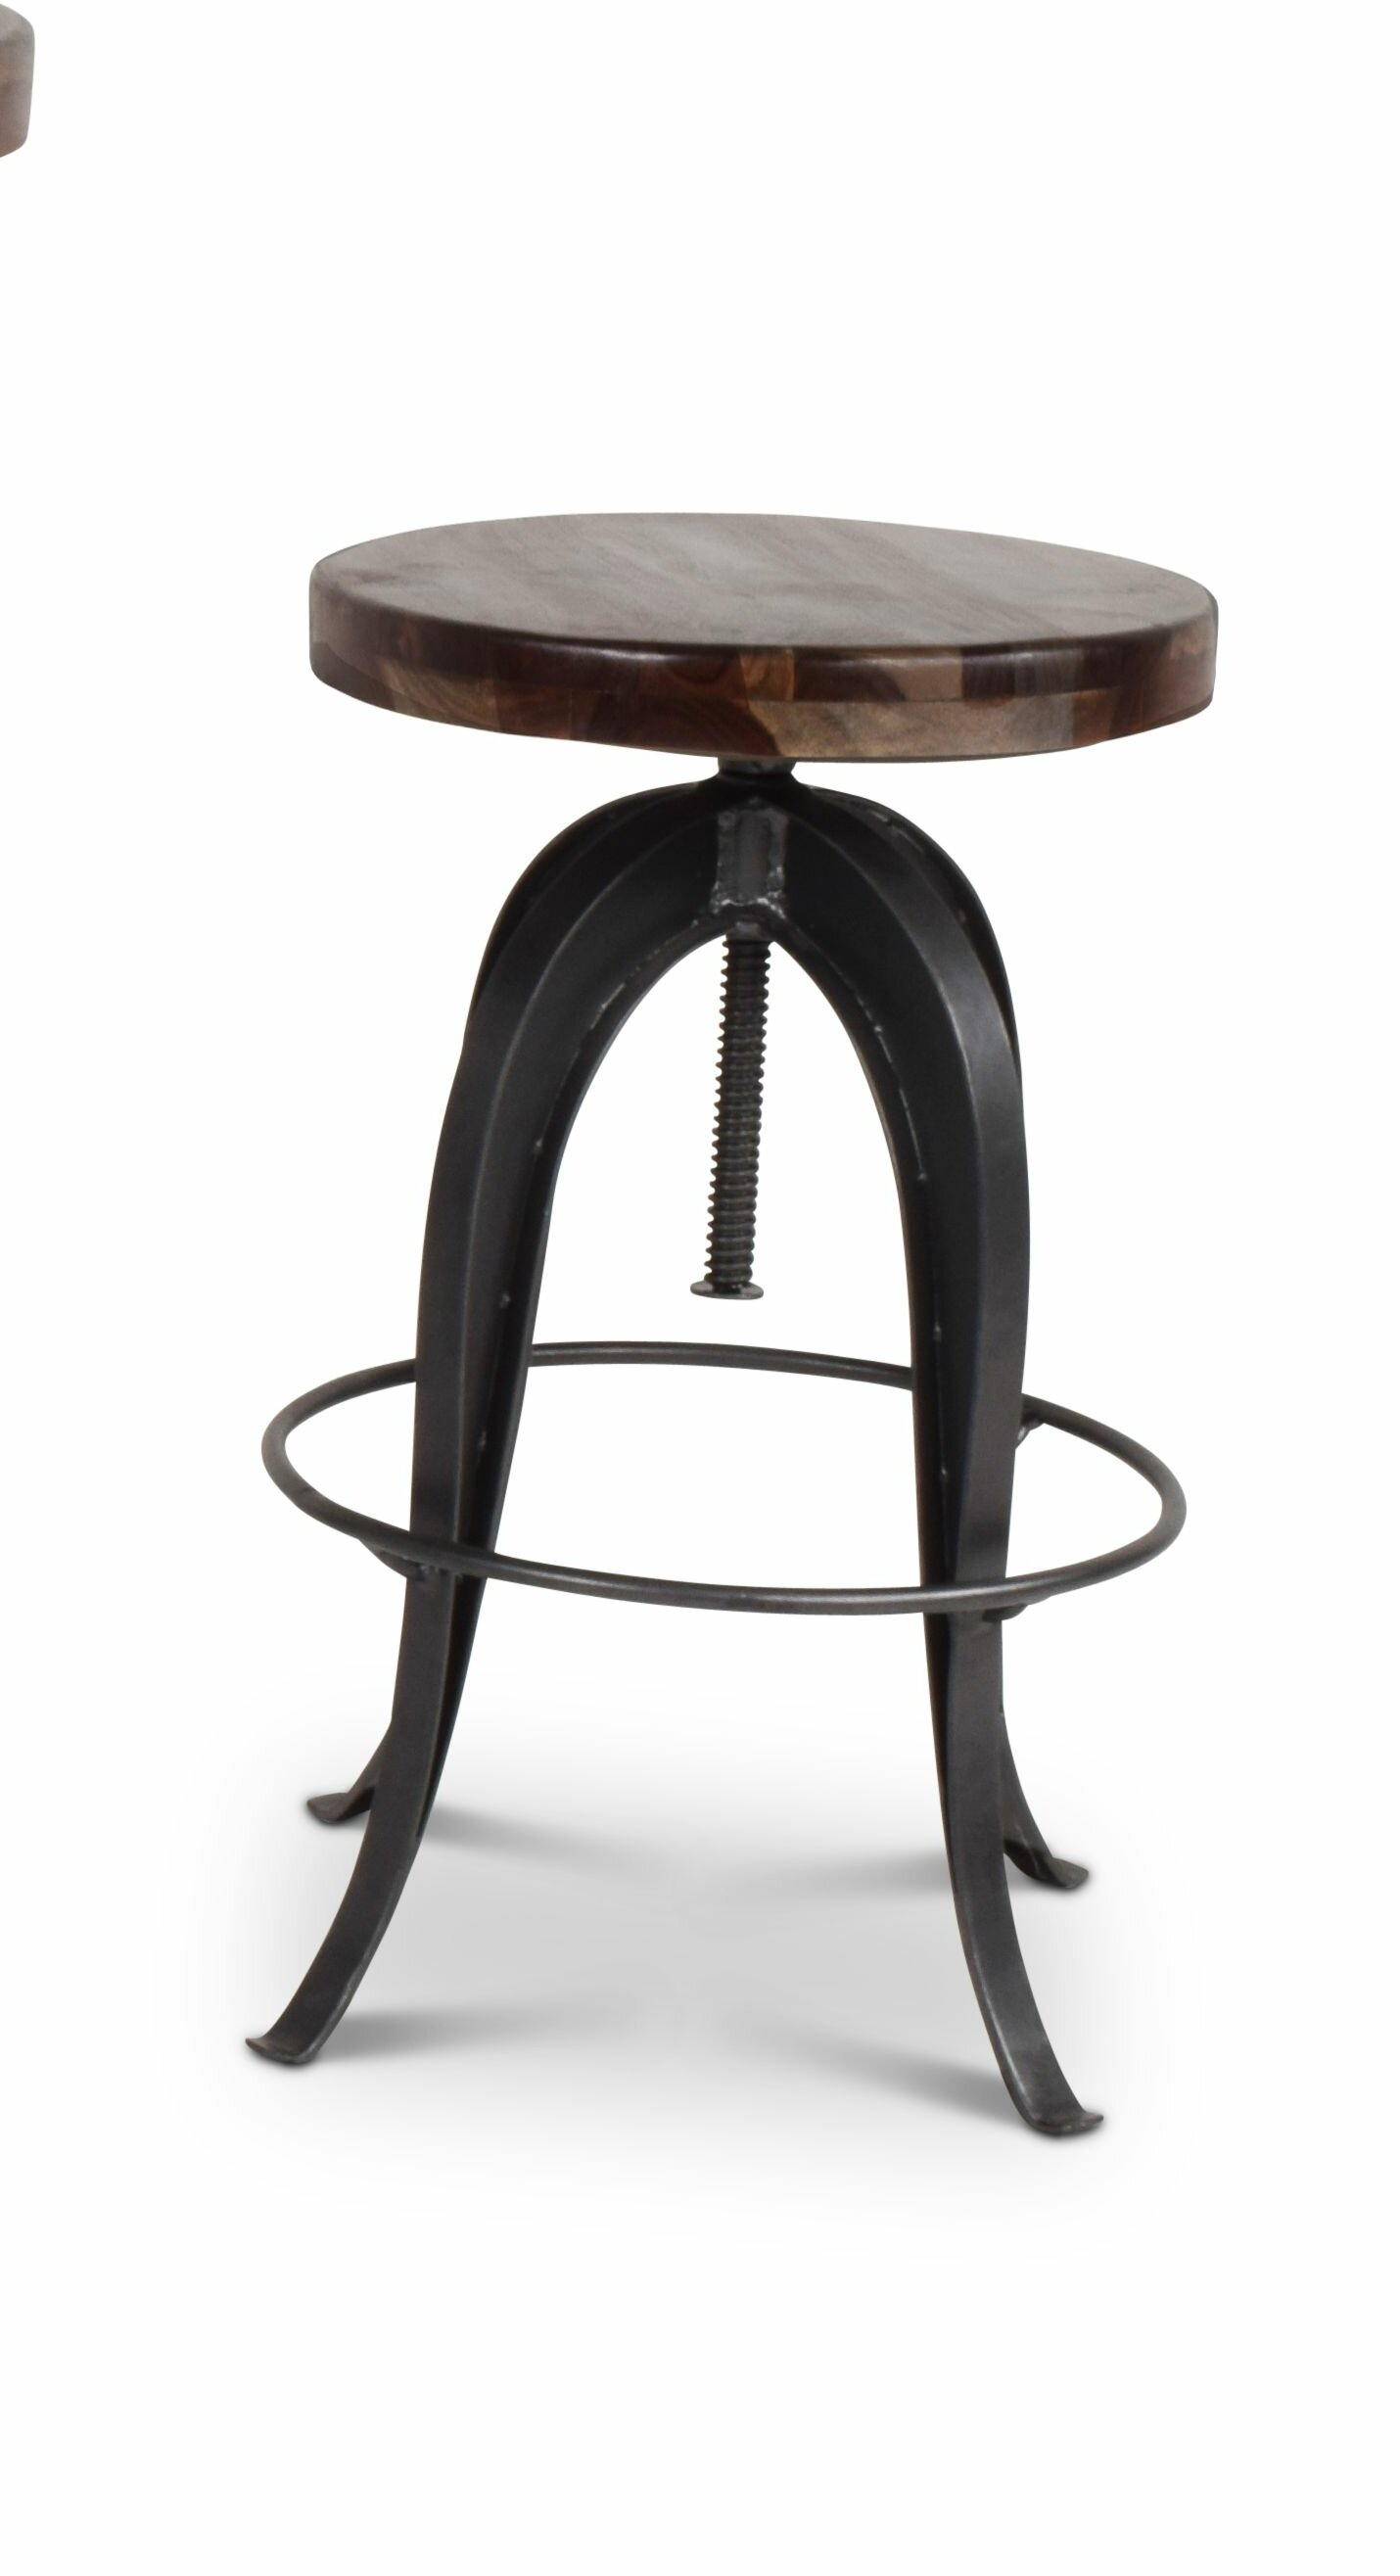 Phenomenal 17 Stories Grigor Adjustable Height Swivel Bar Stool Inzonedesignstudio Interior Chair Design Inzonedesignstudiocom